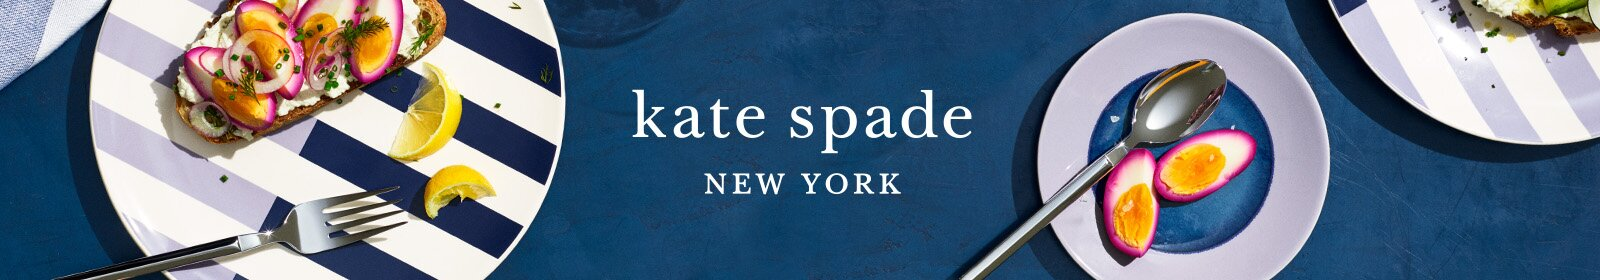 34e552ca6a63 Browse Our Shops/; kate spade new york